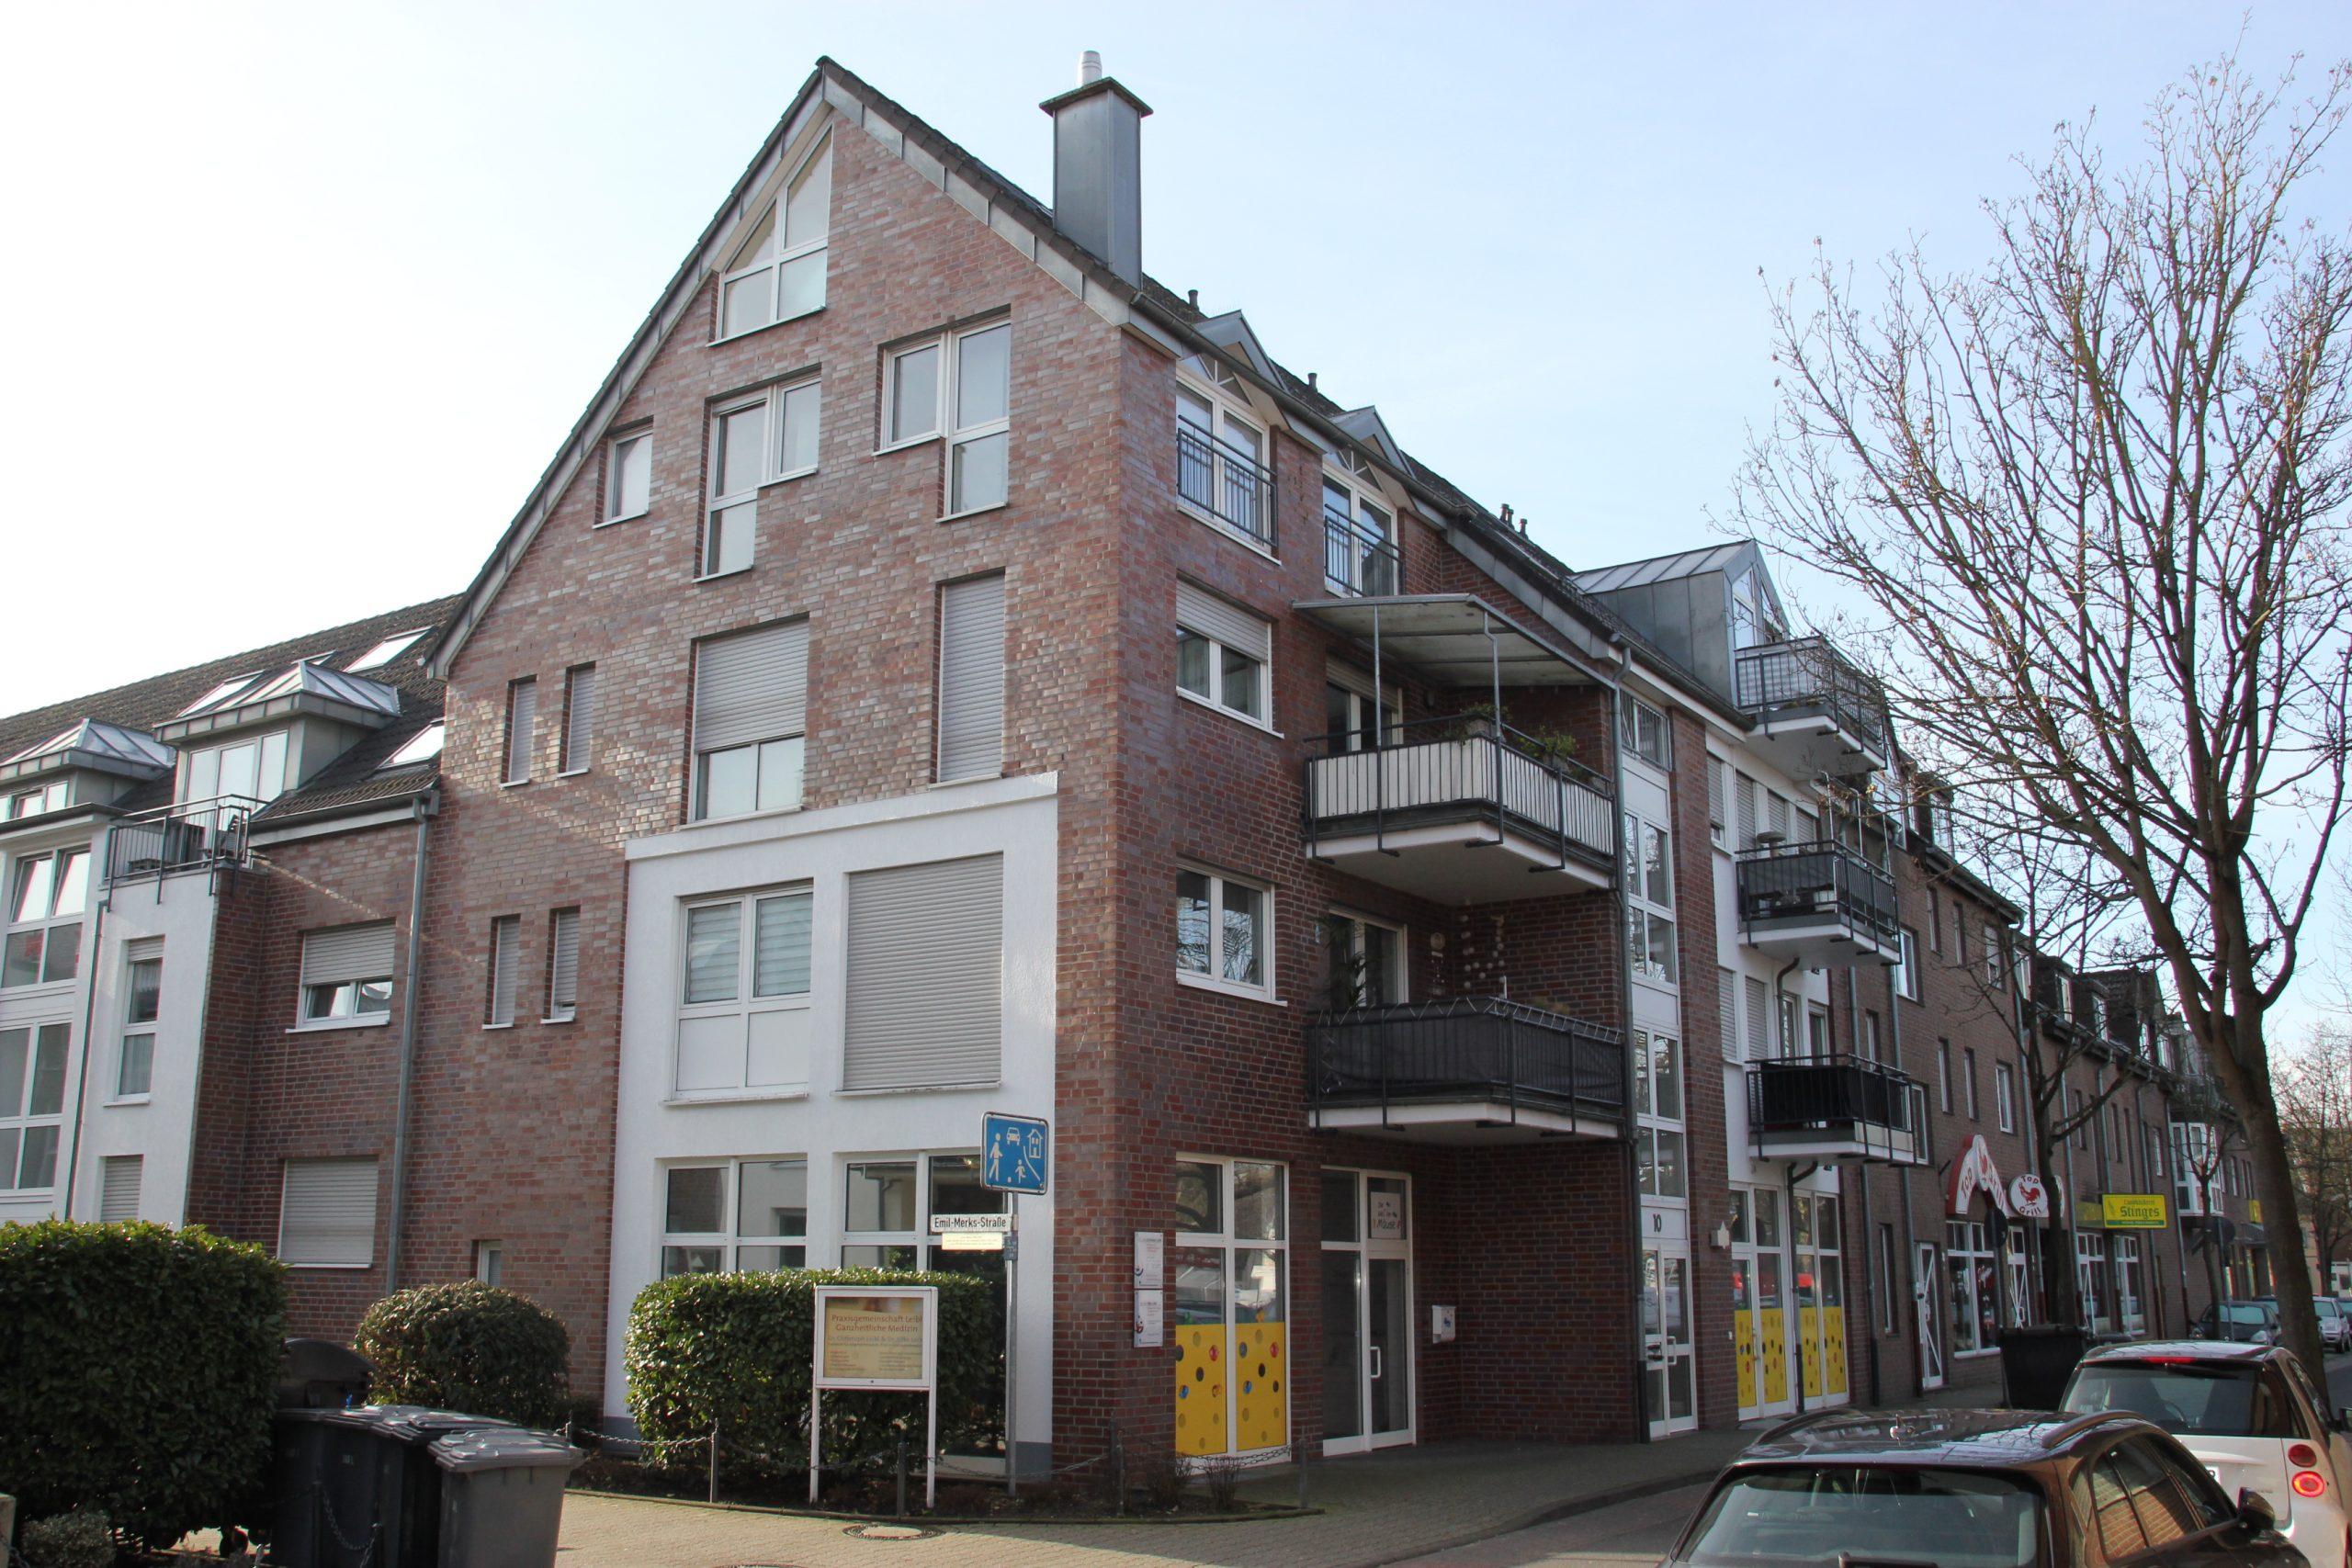 Hausverwaltung Krefeld - Brauereistraße - Mietverwalter